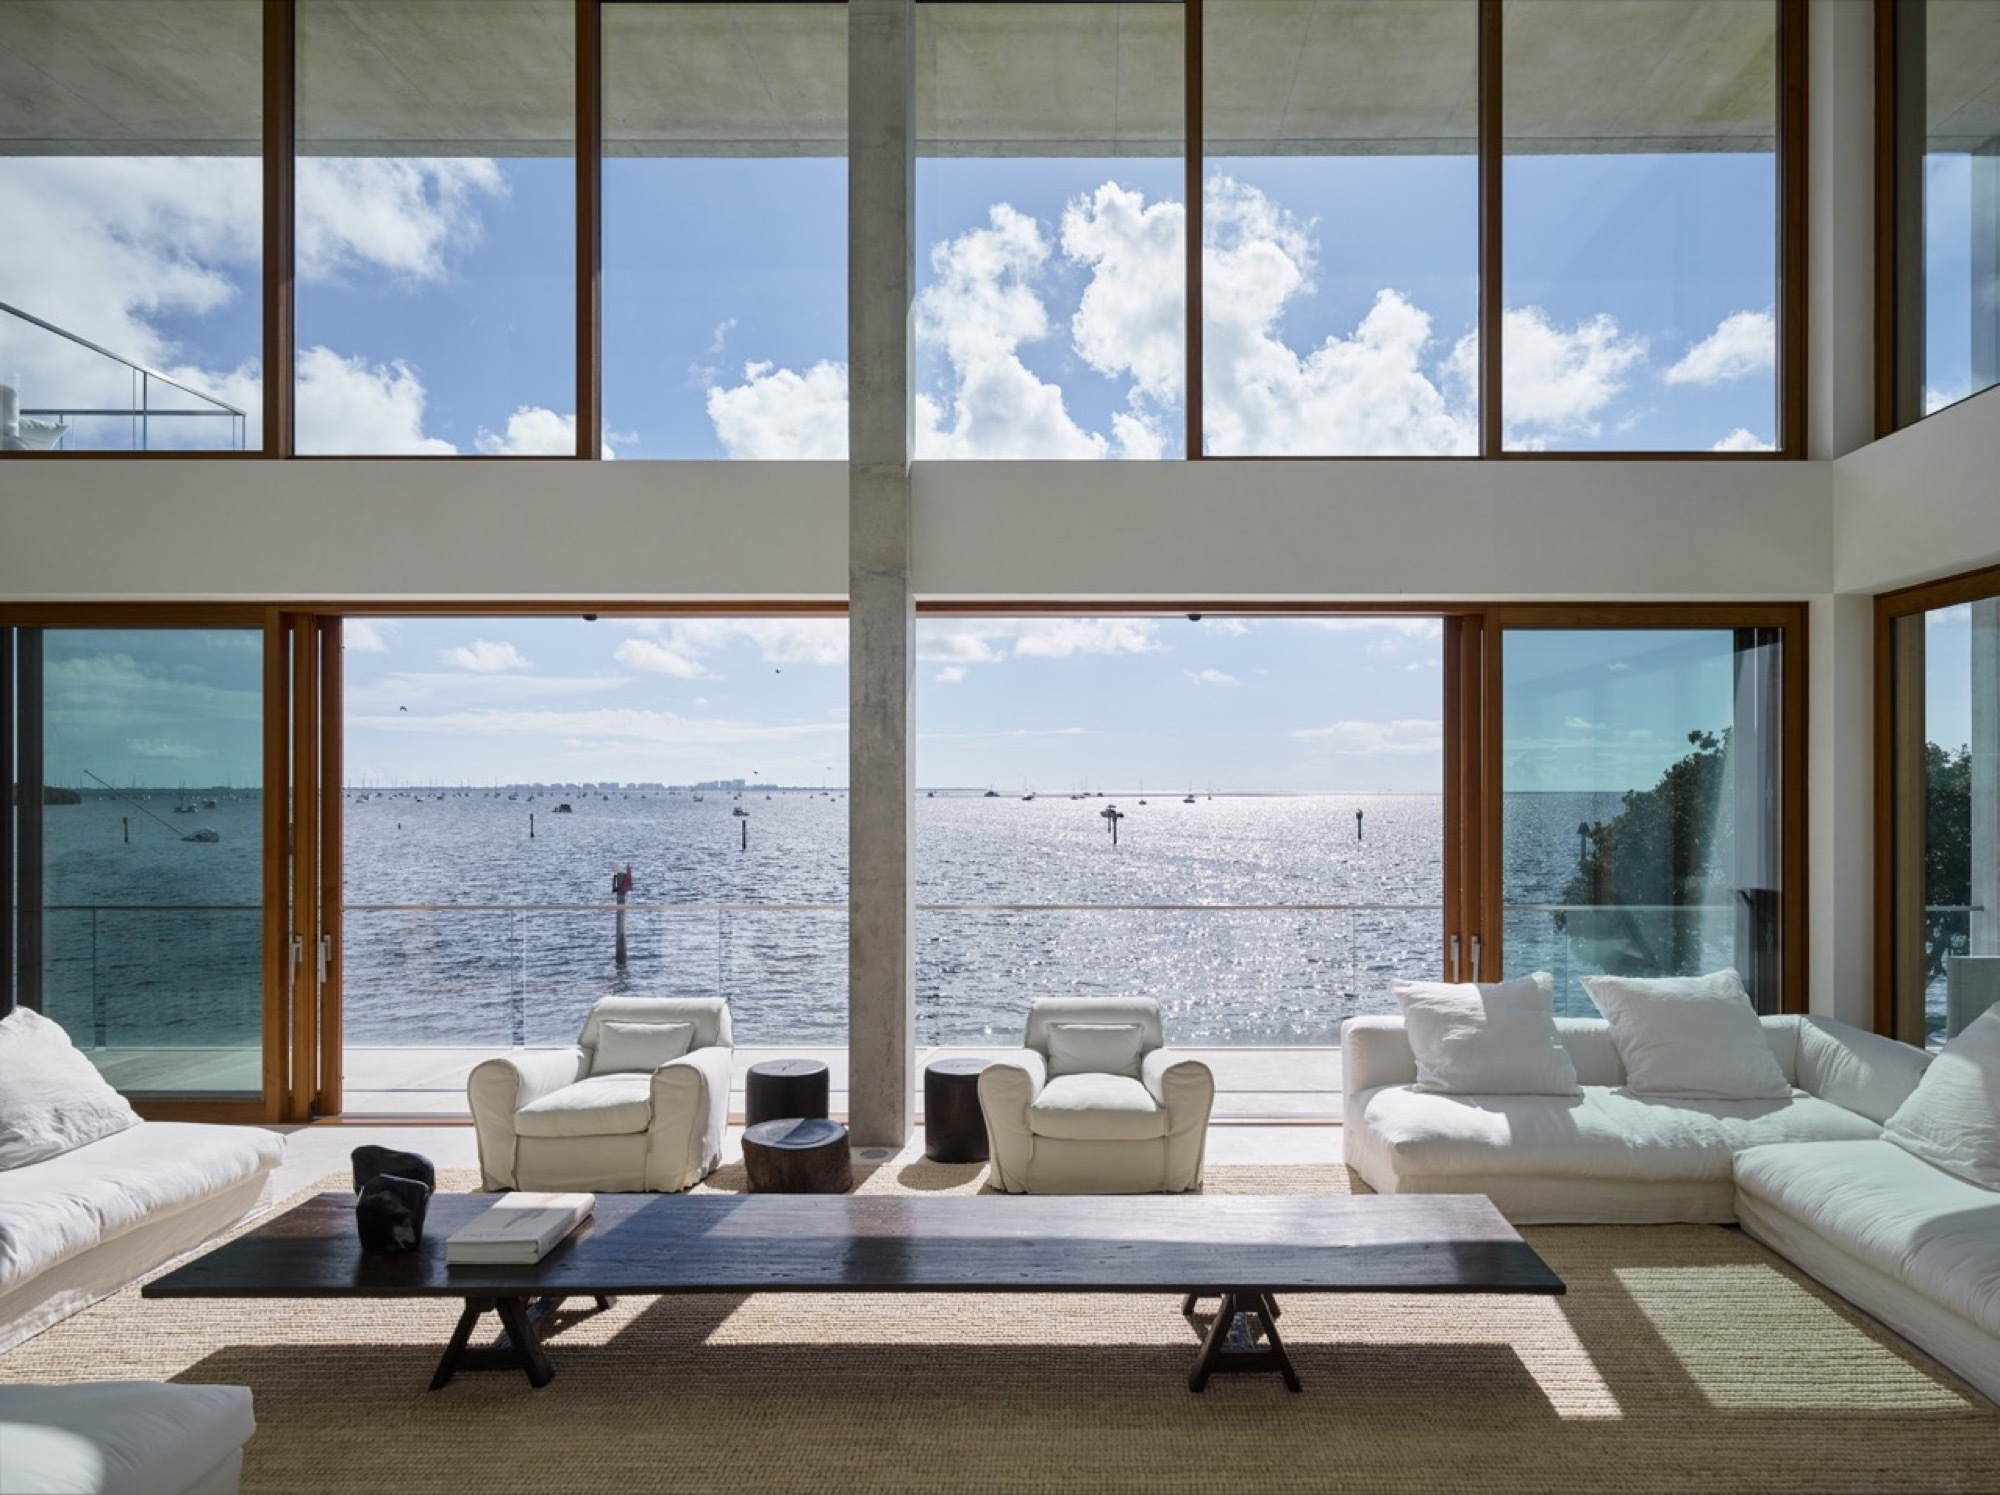 Casa Home Decor Gallery Of Casa Bahia Alejandro Landes 4